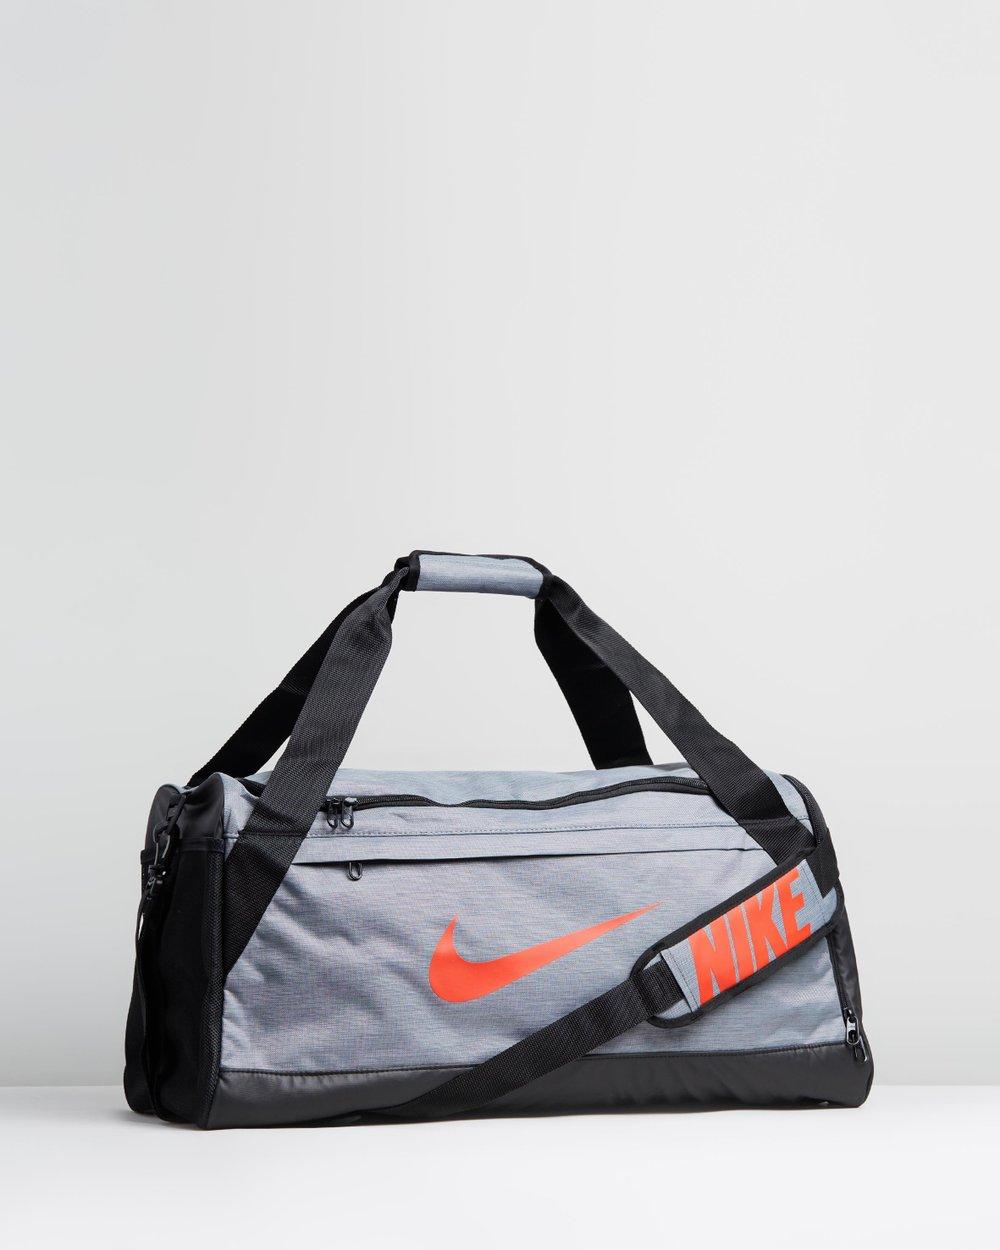 176a9fb5e04c6 Brasilia Training Duffle Bag by Nike Online